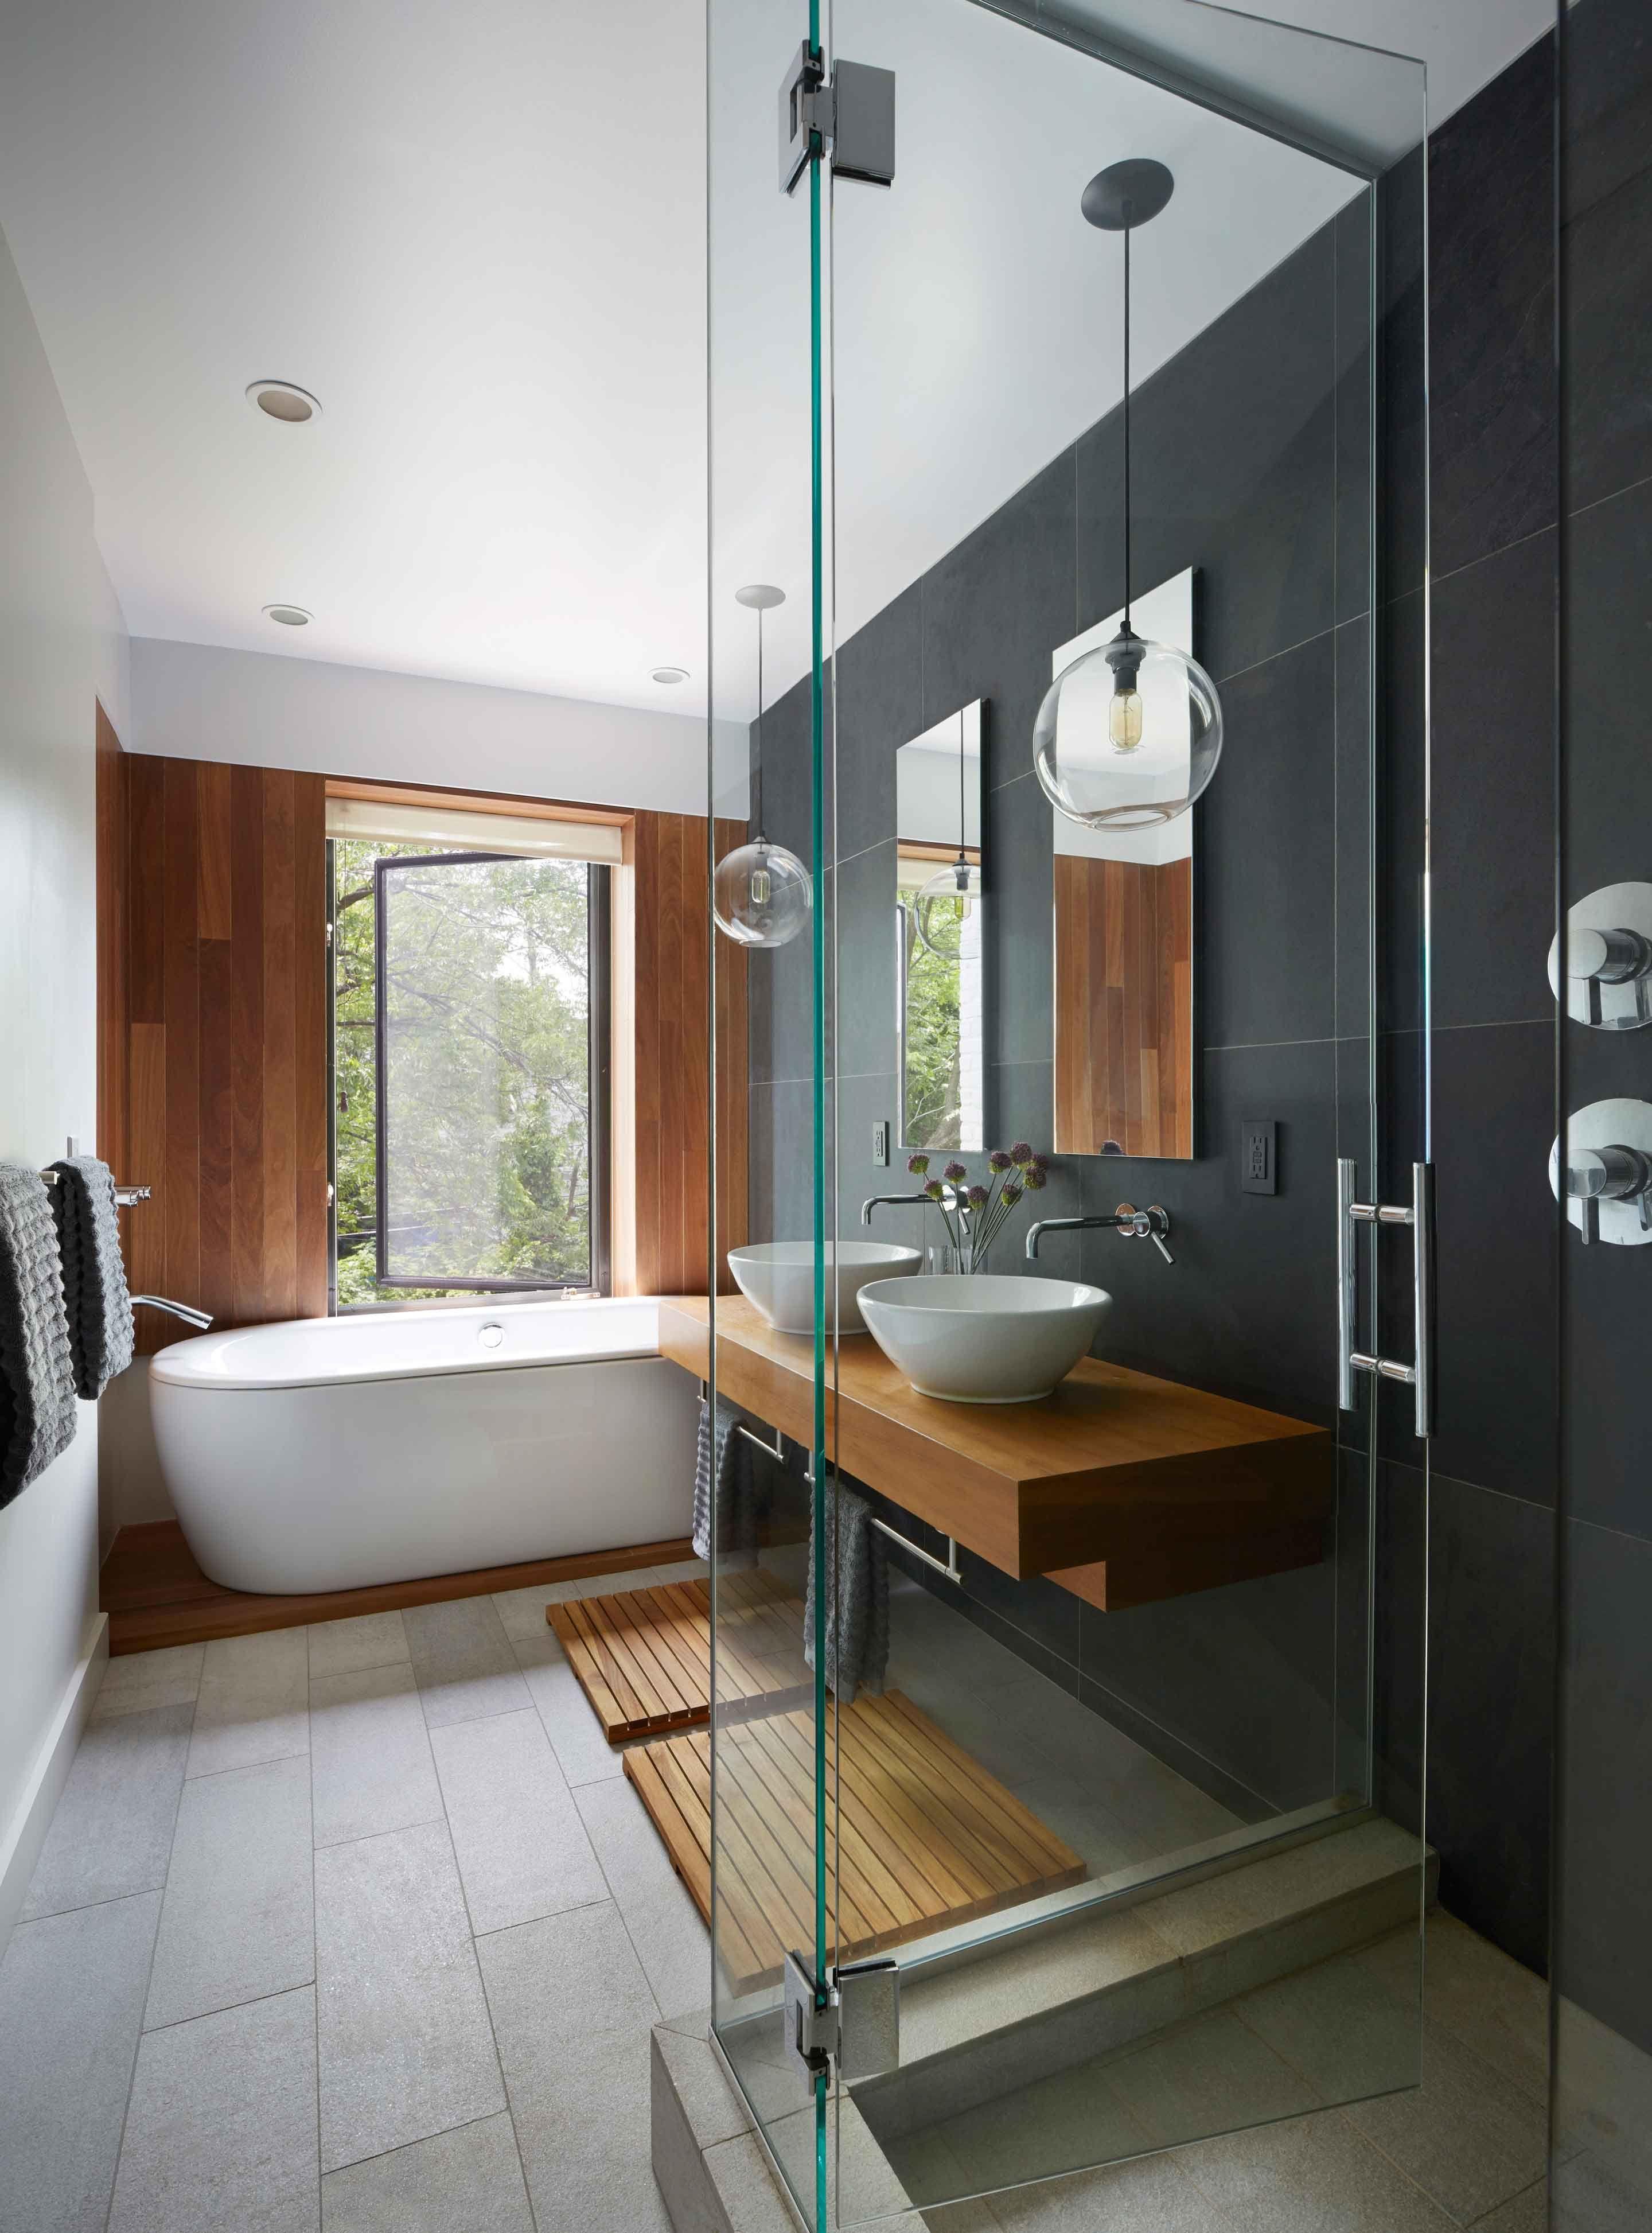 Etelamaki Architecture  baño  Pinterest  욕실, 화장실 및 욕실 인테리어